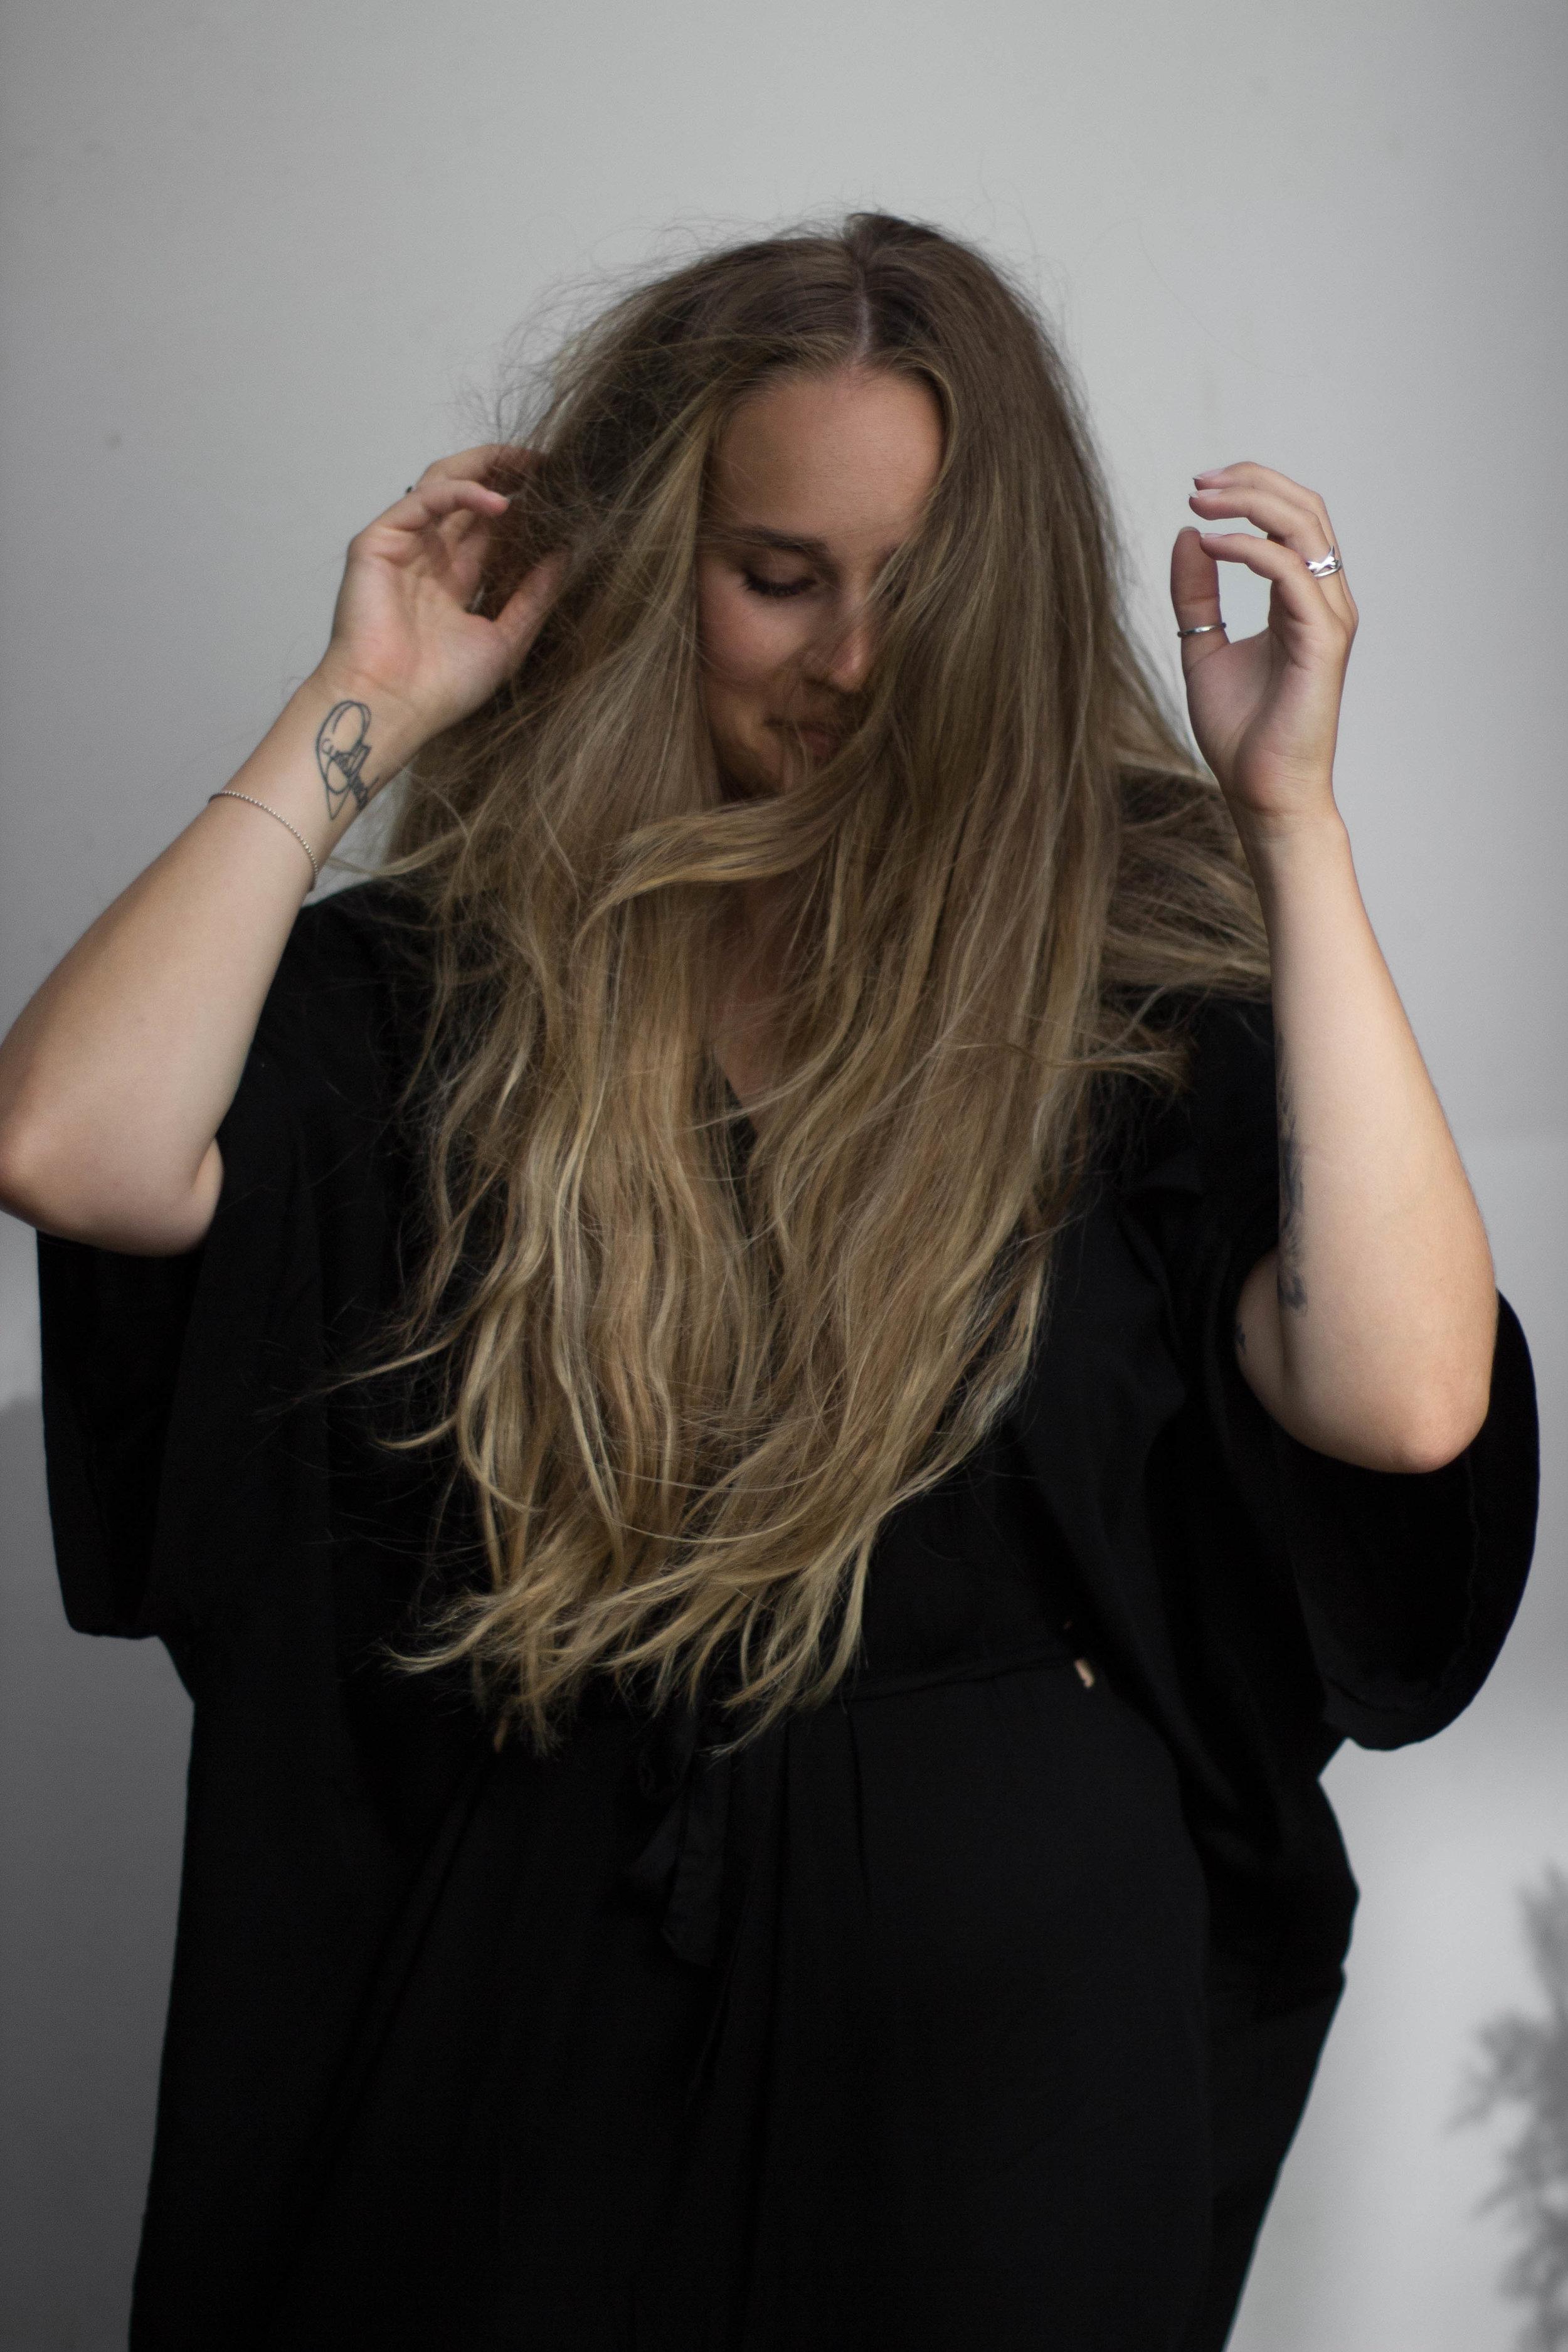 löwengrip, blondehair, beachahair, aboutthatlook löwengrip haircare, haircare, beauty